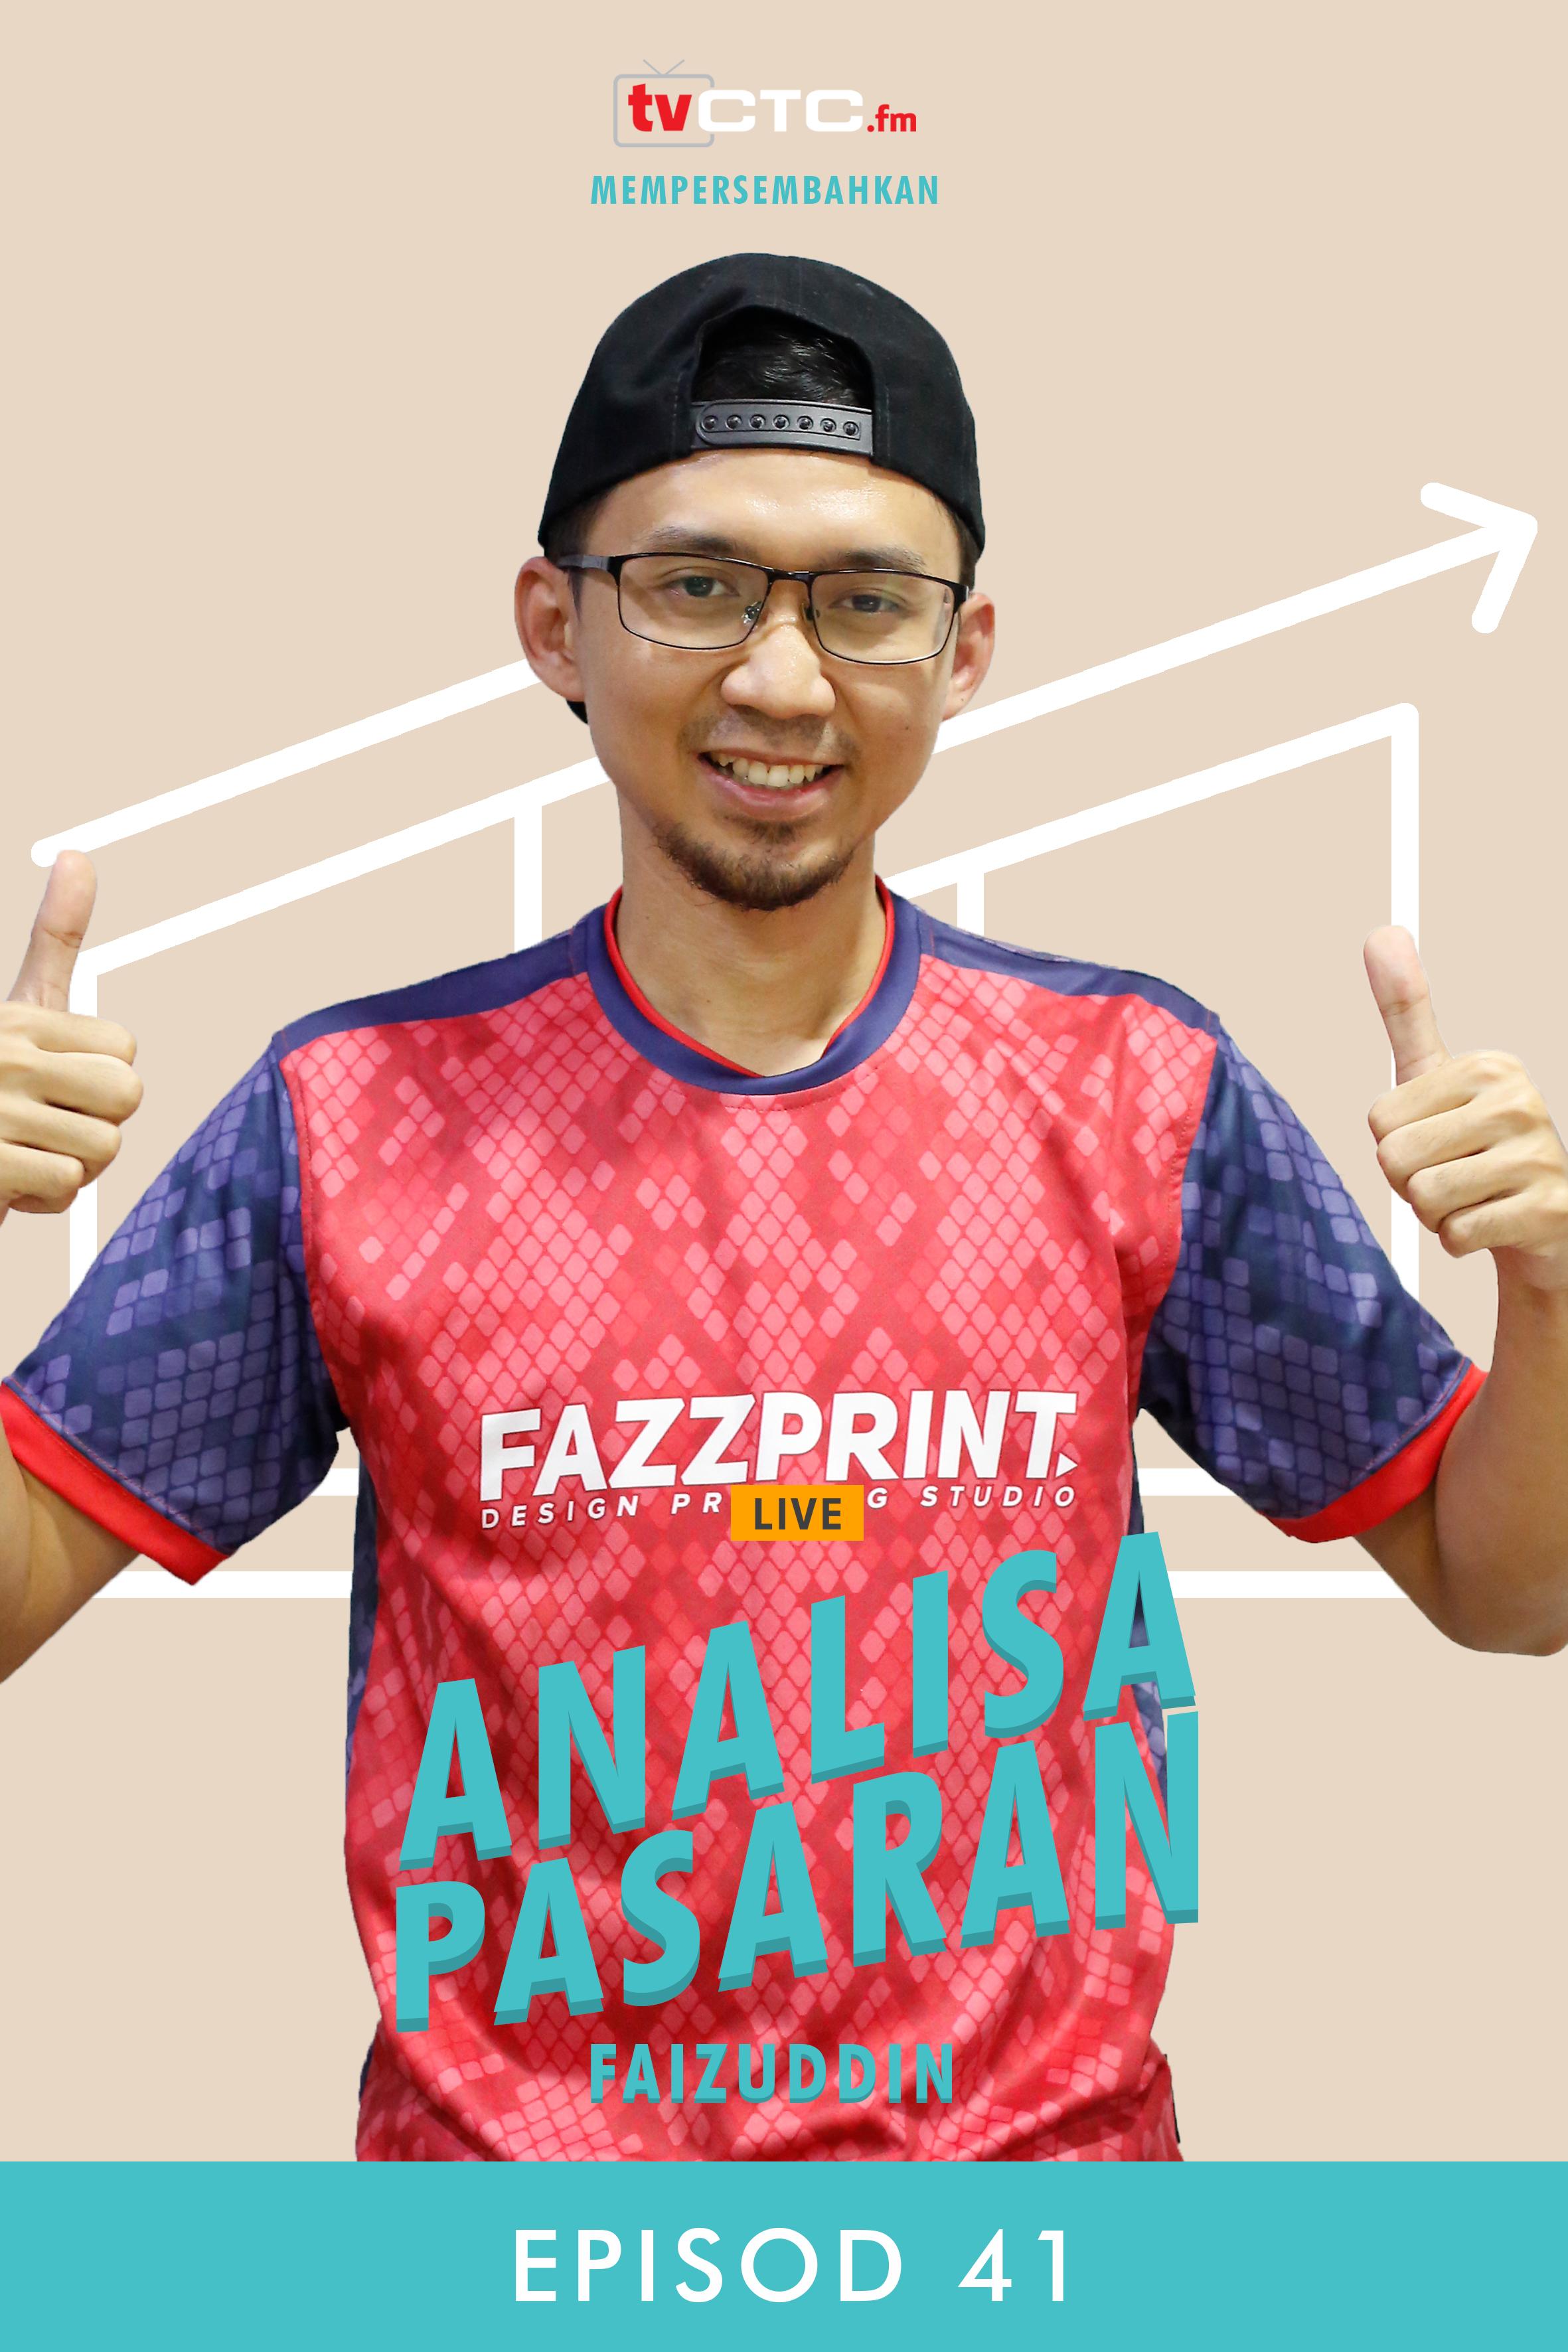 ANALISA PASARAN : Faizuddin (Episod 41)